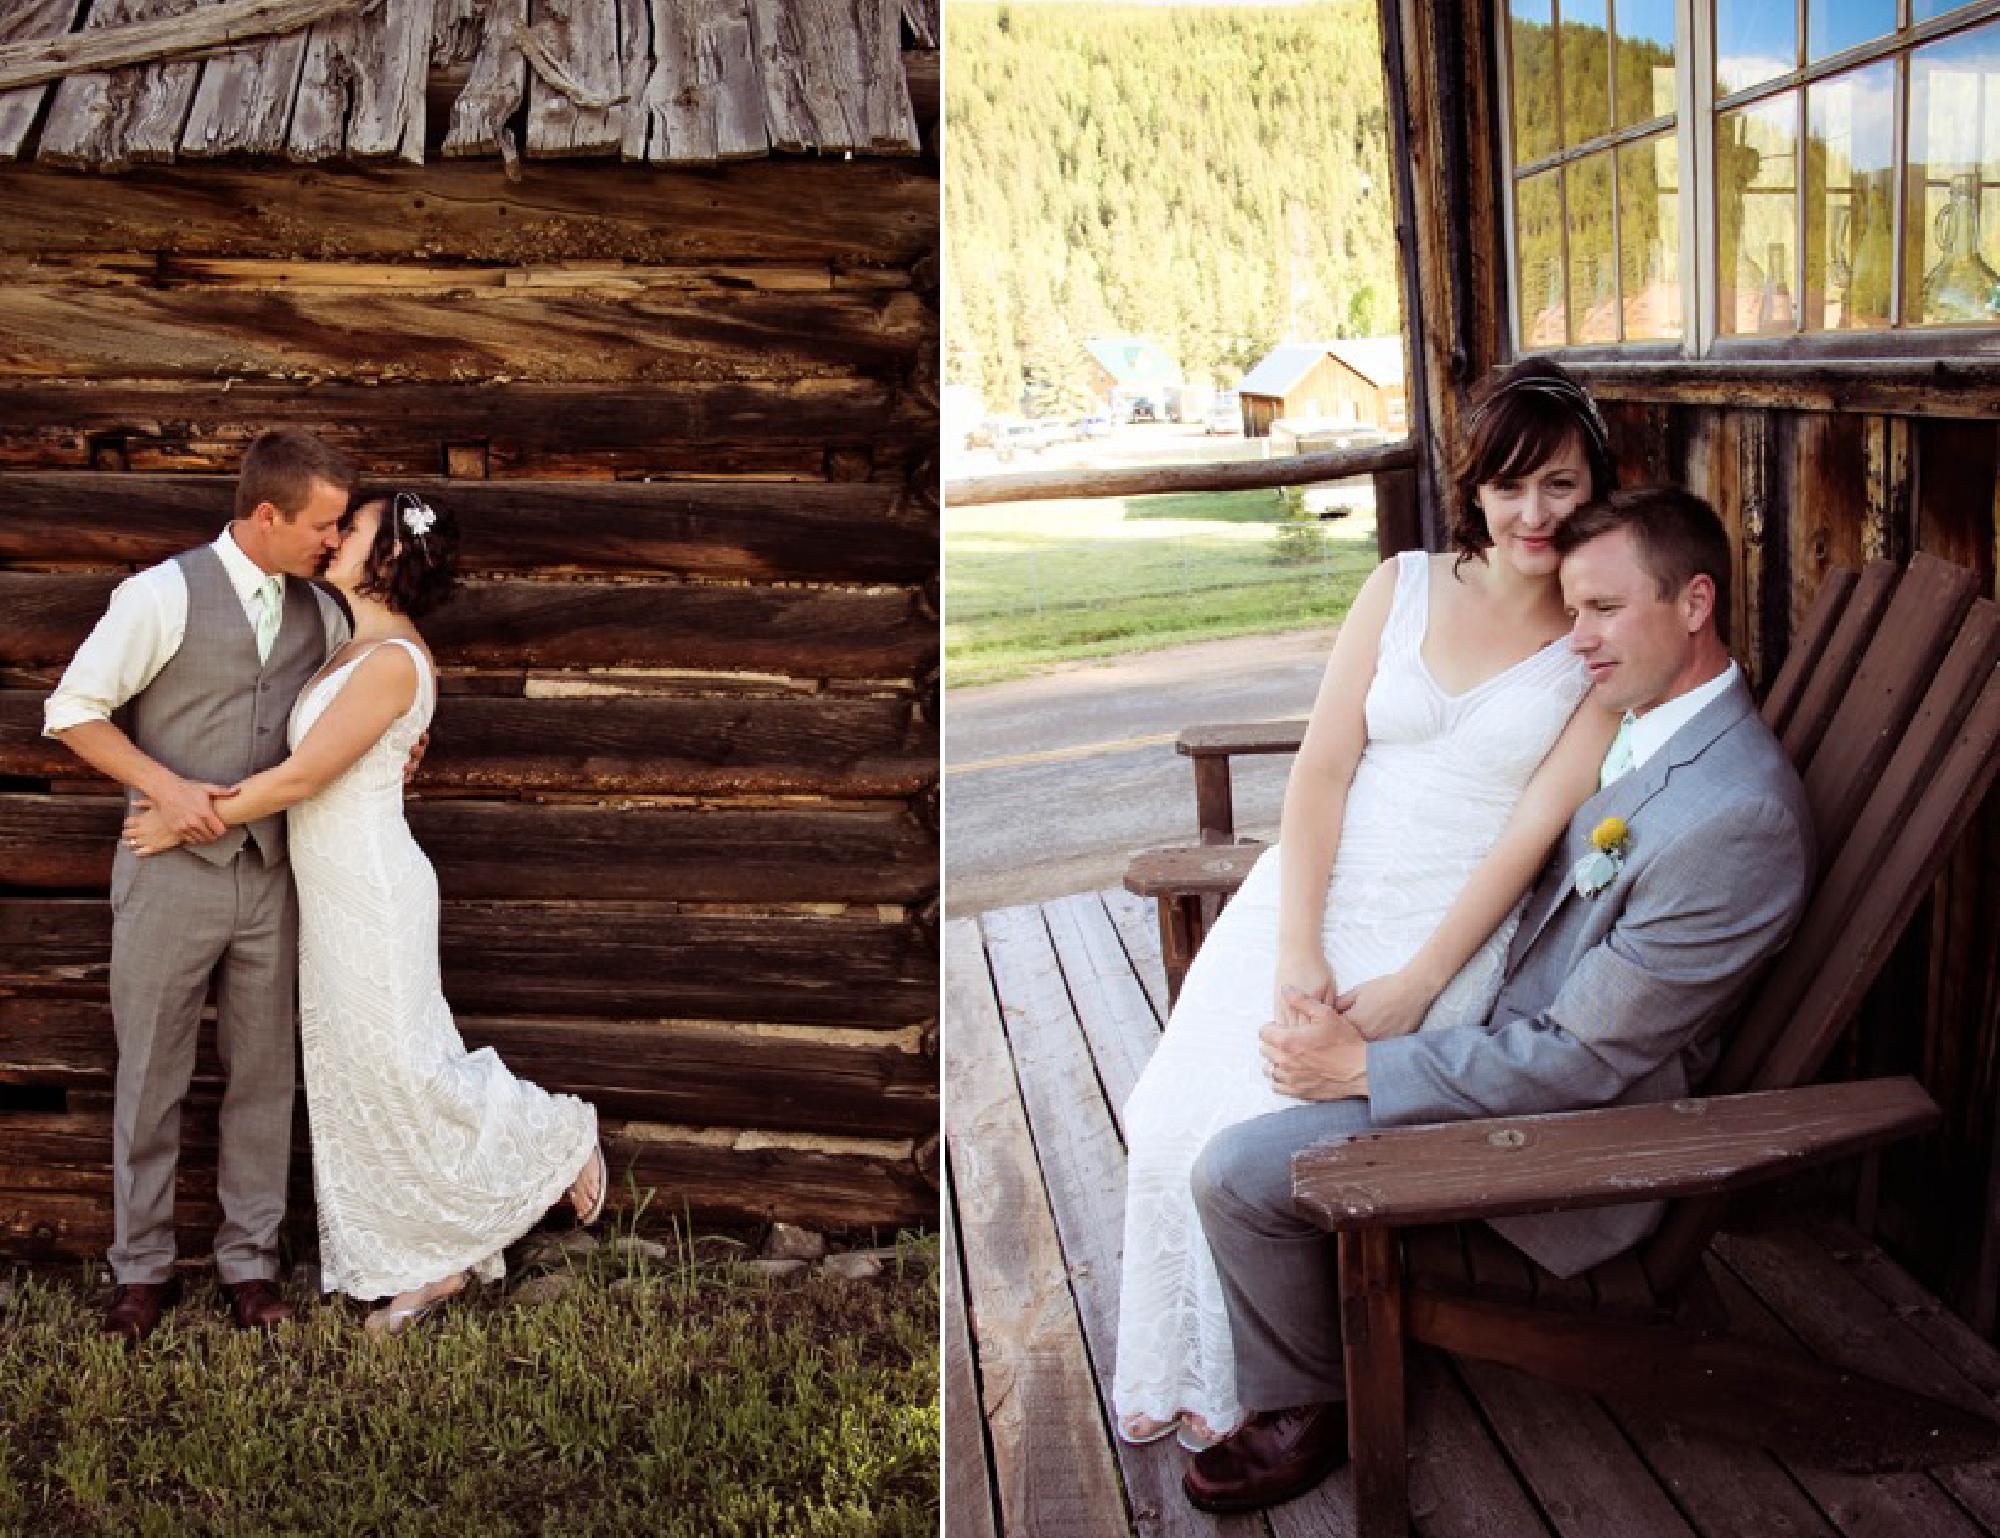 Kimberly_Eric_Mountain_Town_Wedding_4.jpeg